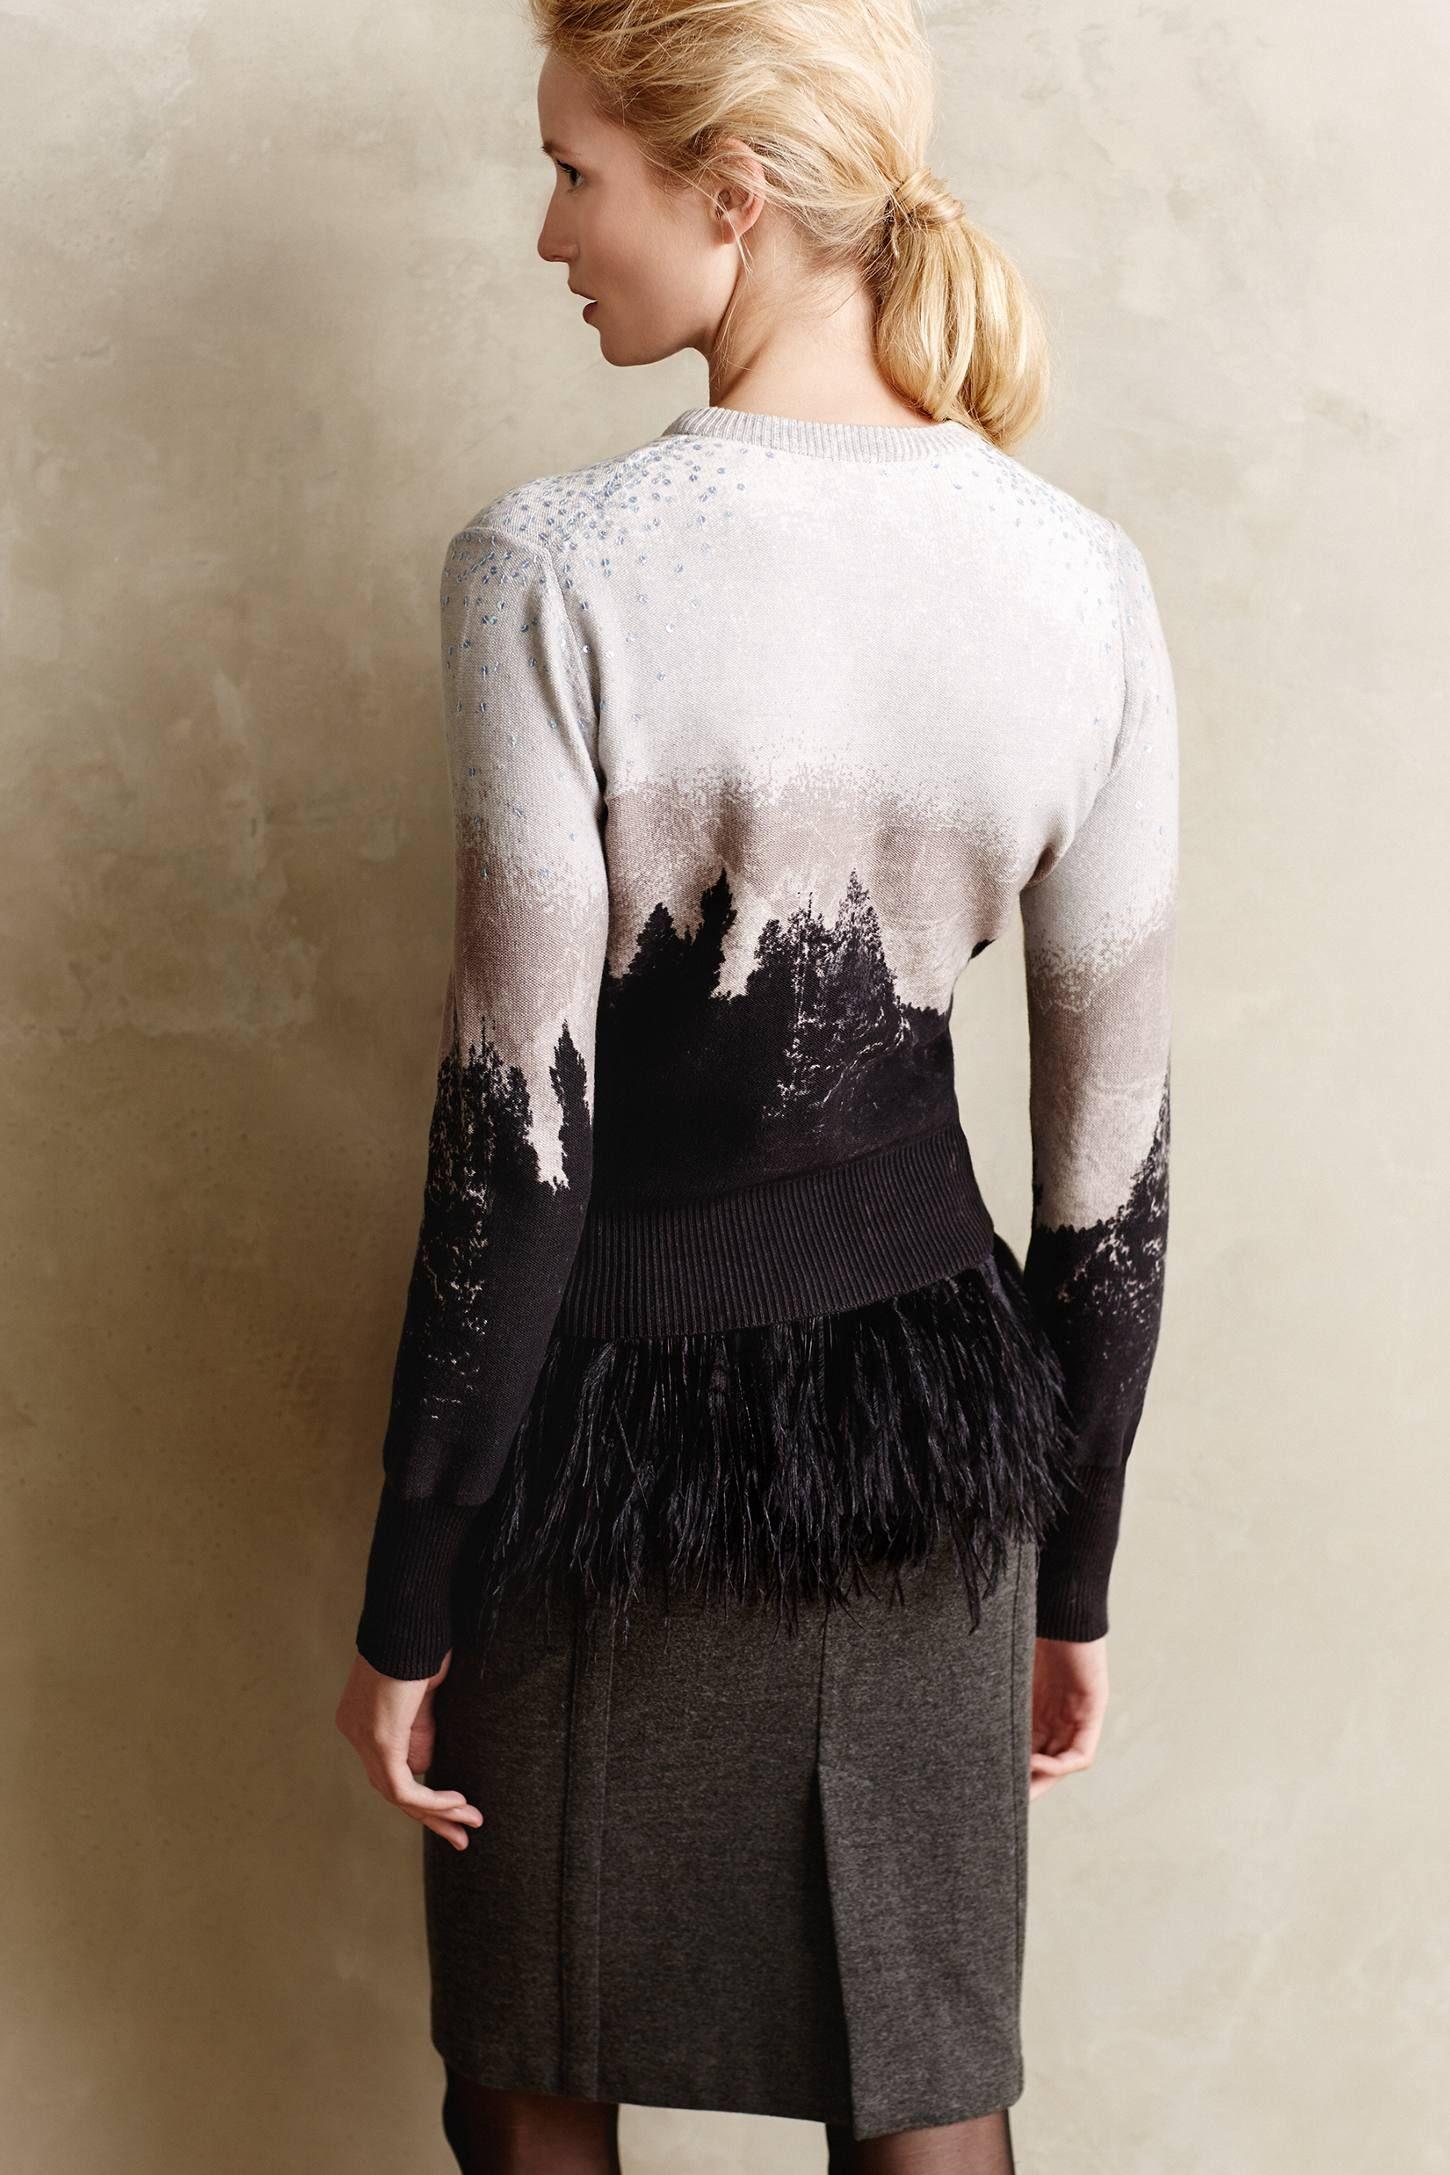 Treeline Printed Cardi (With images) Knitwear fashion